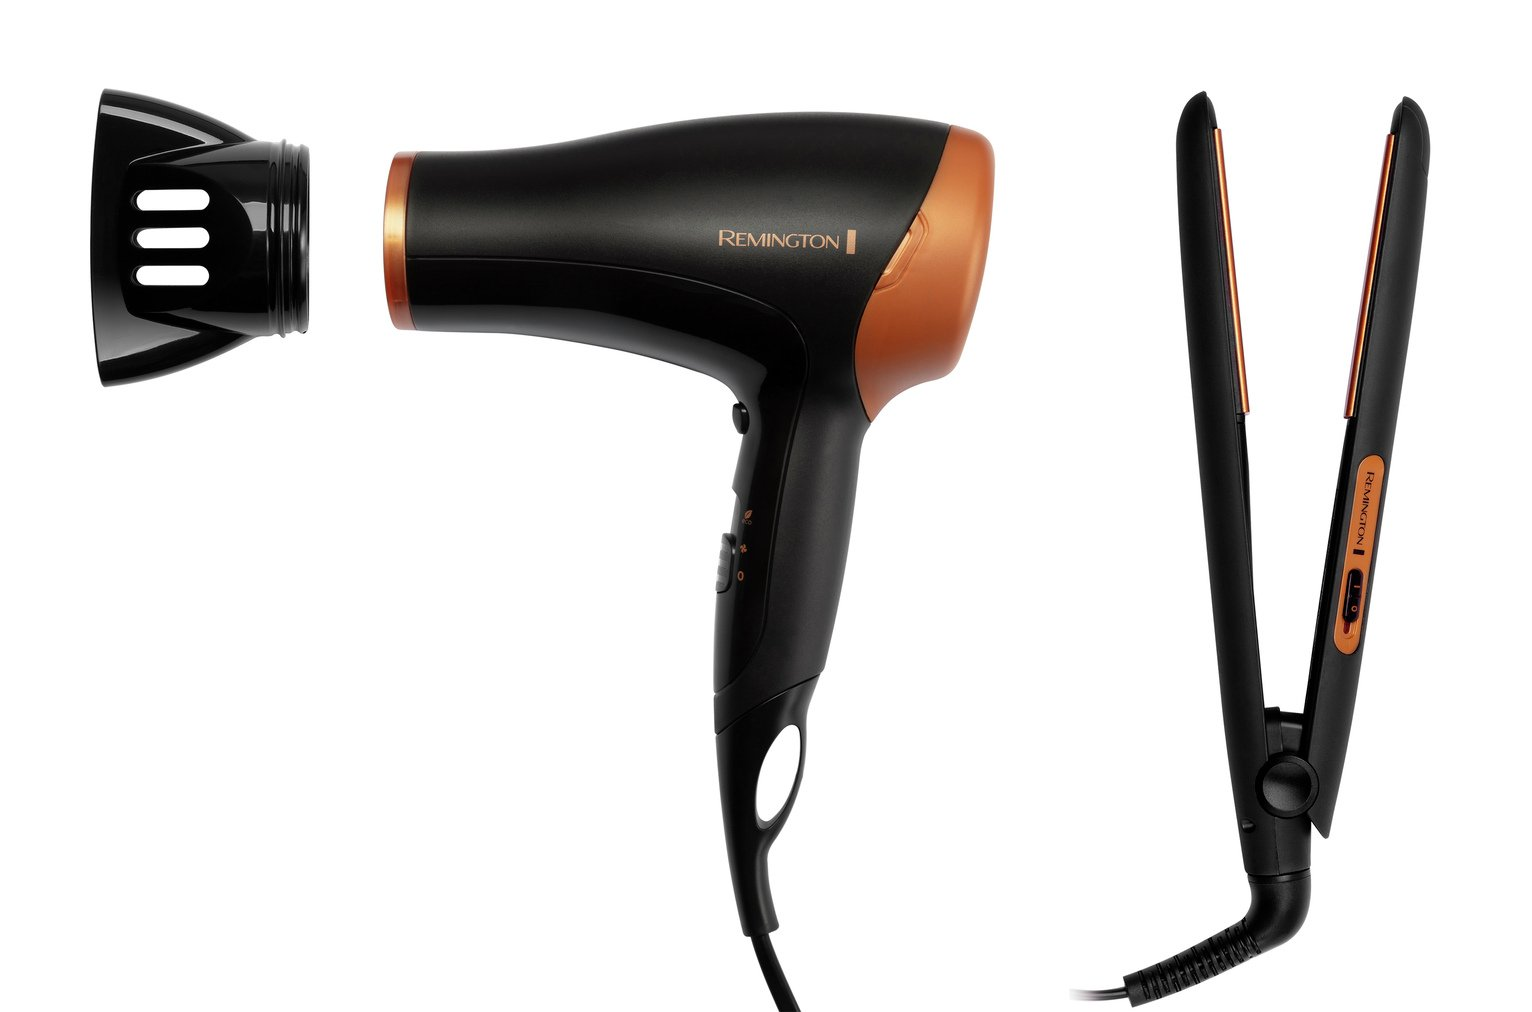 Remington Copper Hair Straightener and Dryer Gift Set